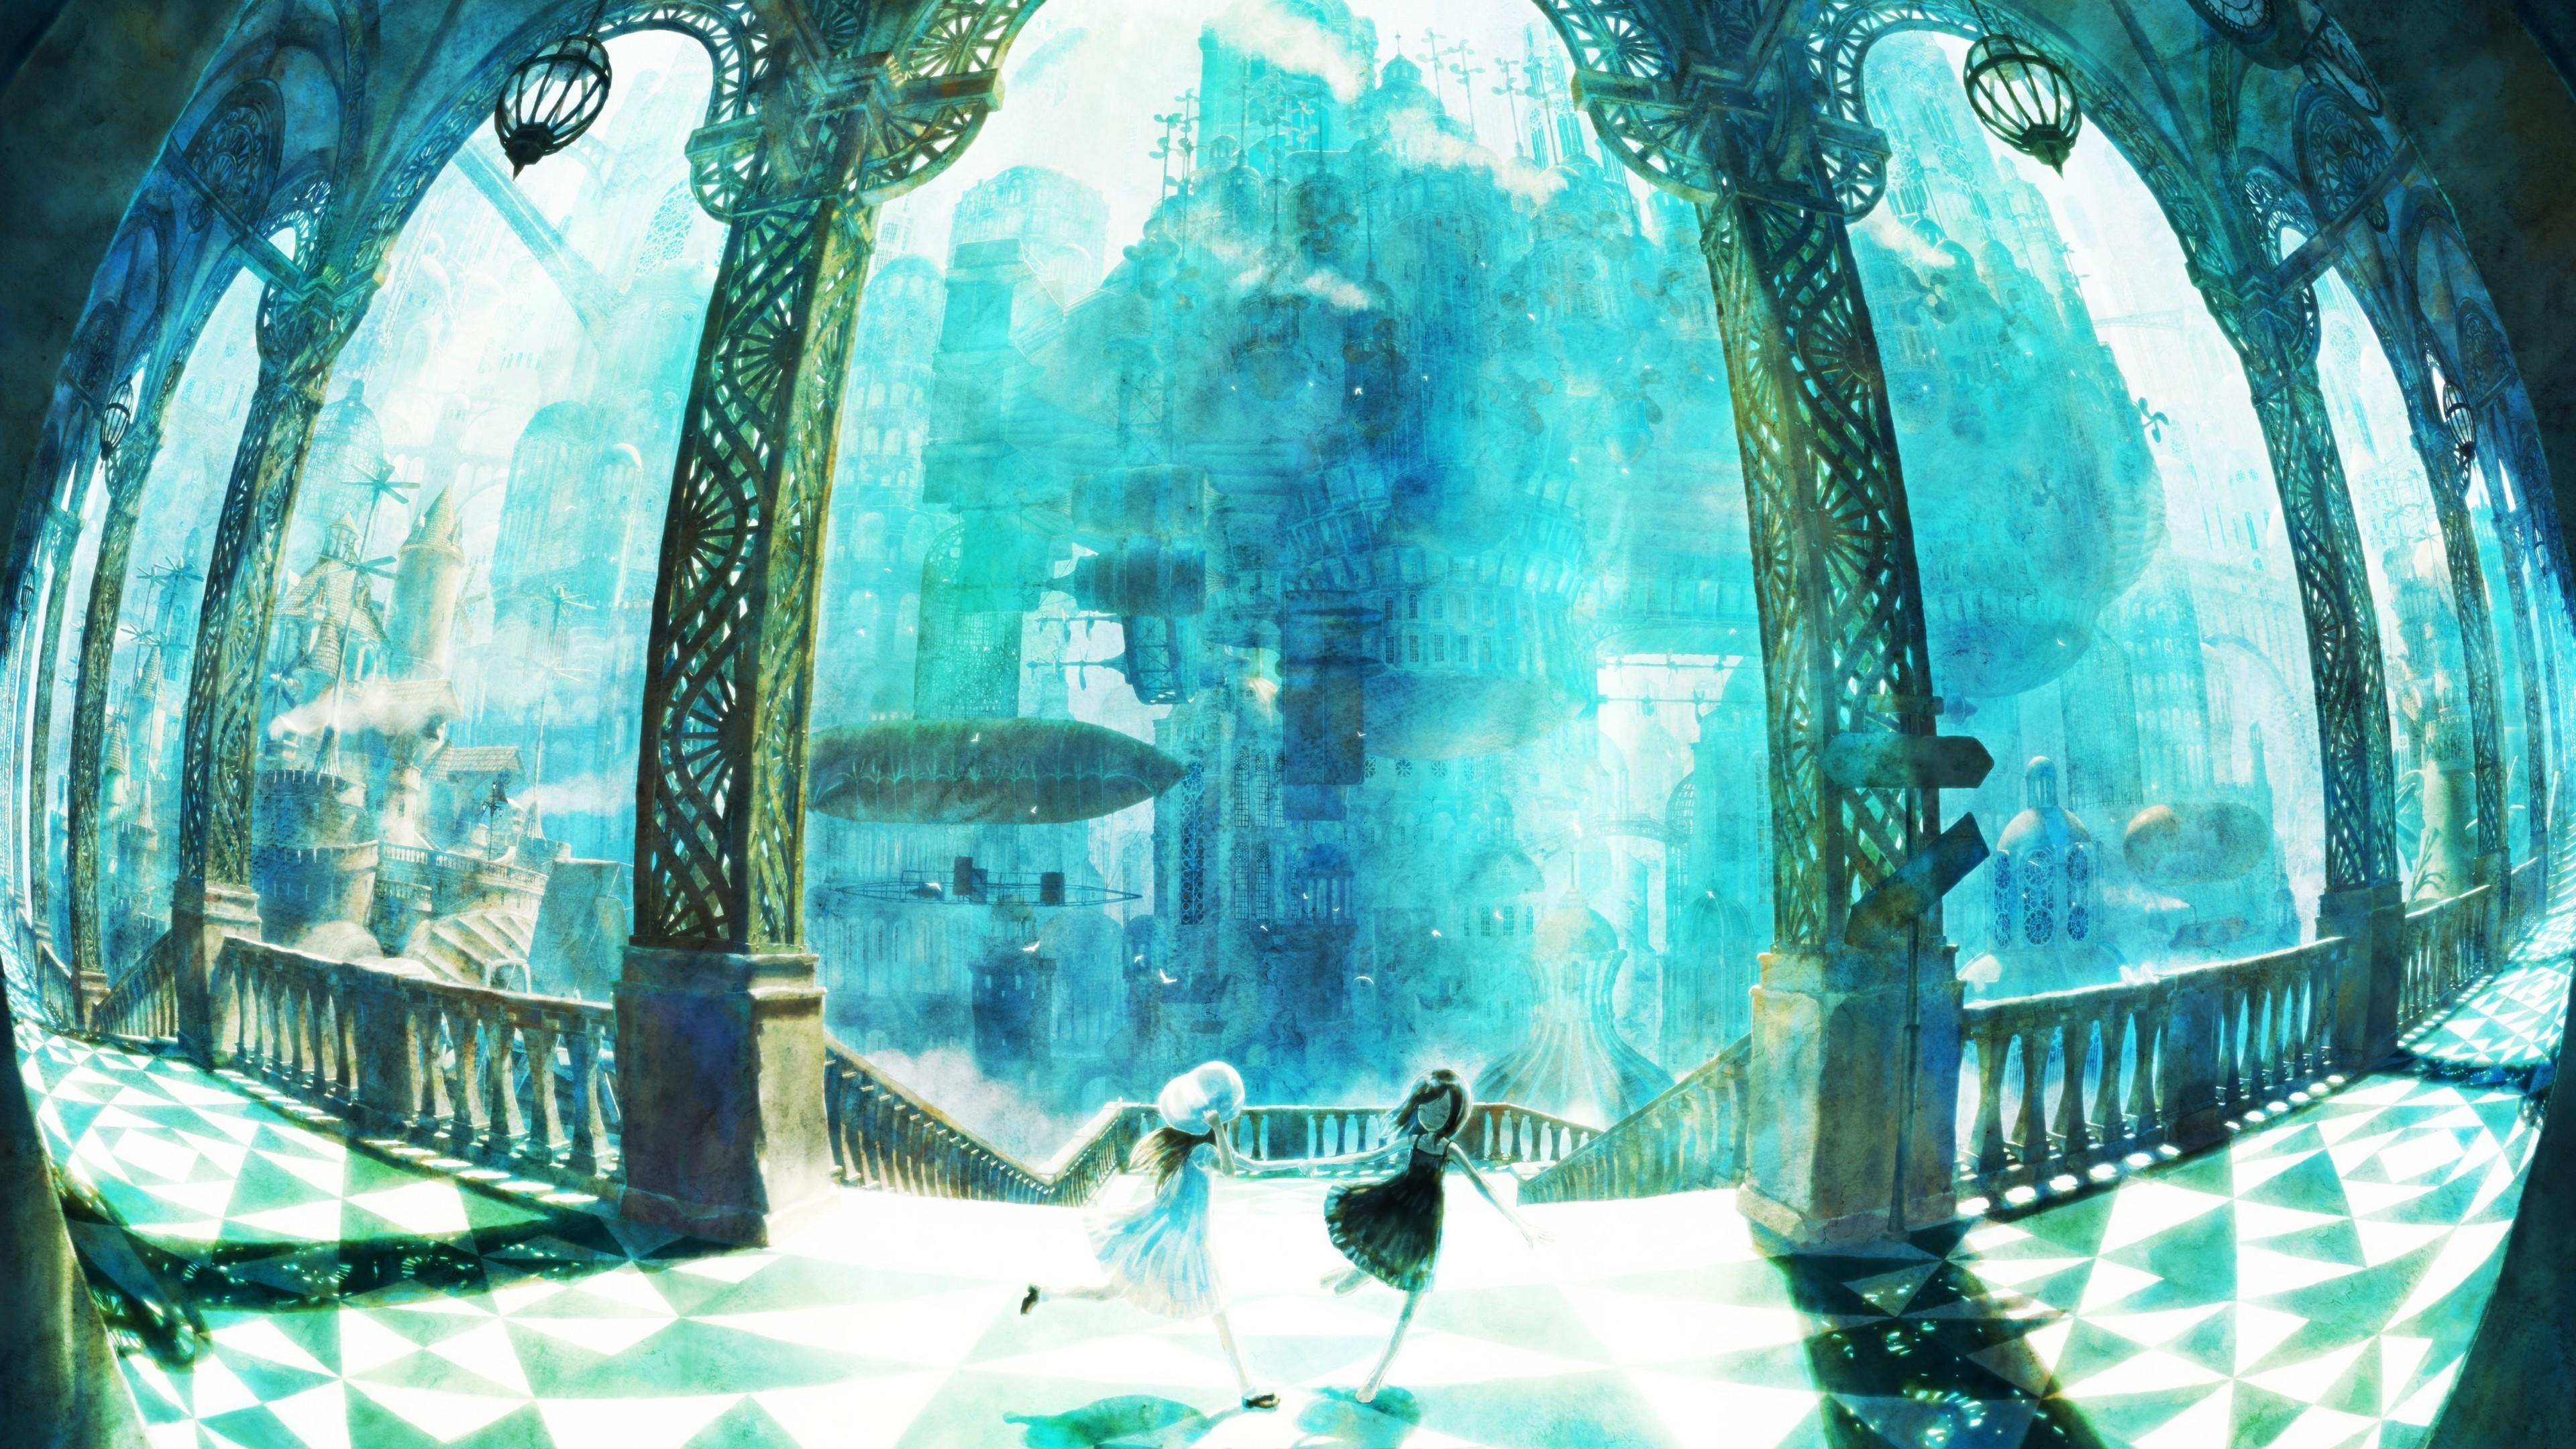 Res: 3840x2160, Anime Fantasy World, Castle, Airship, Running Around, Kids, Columns